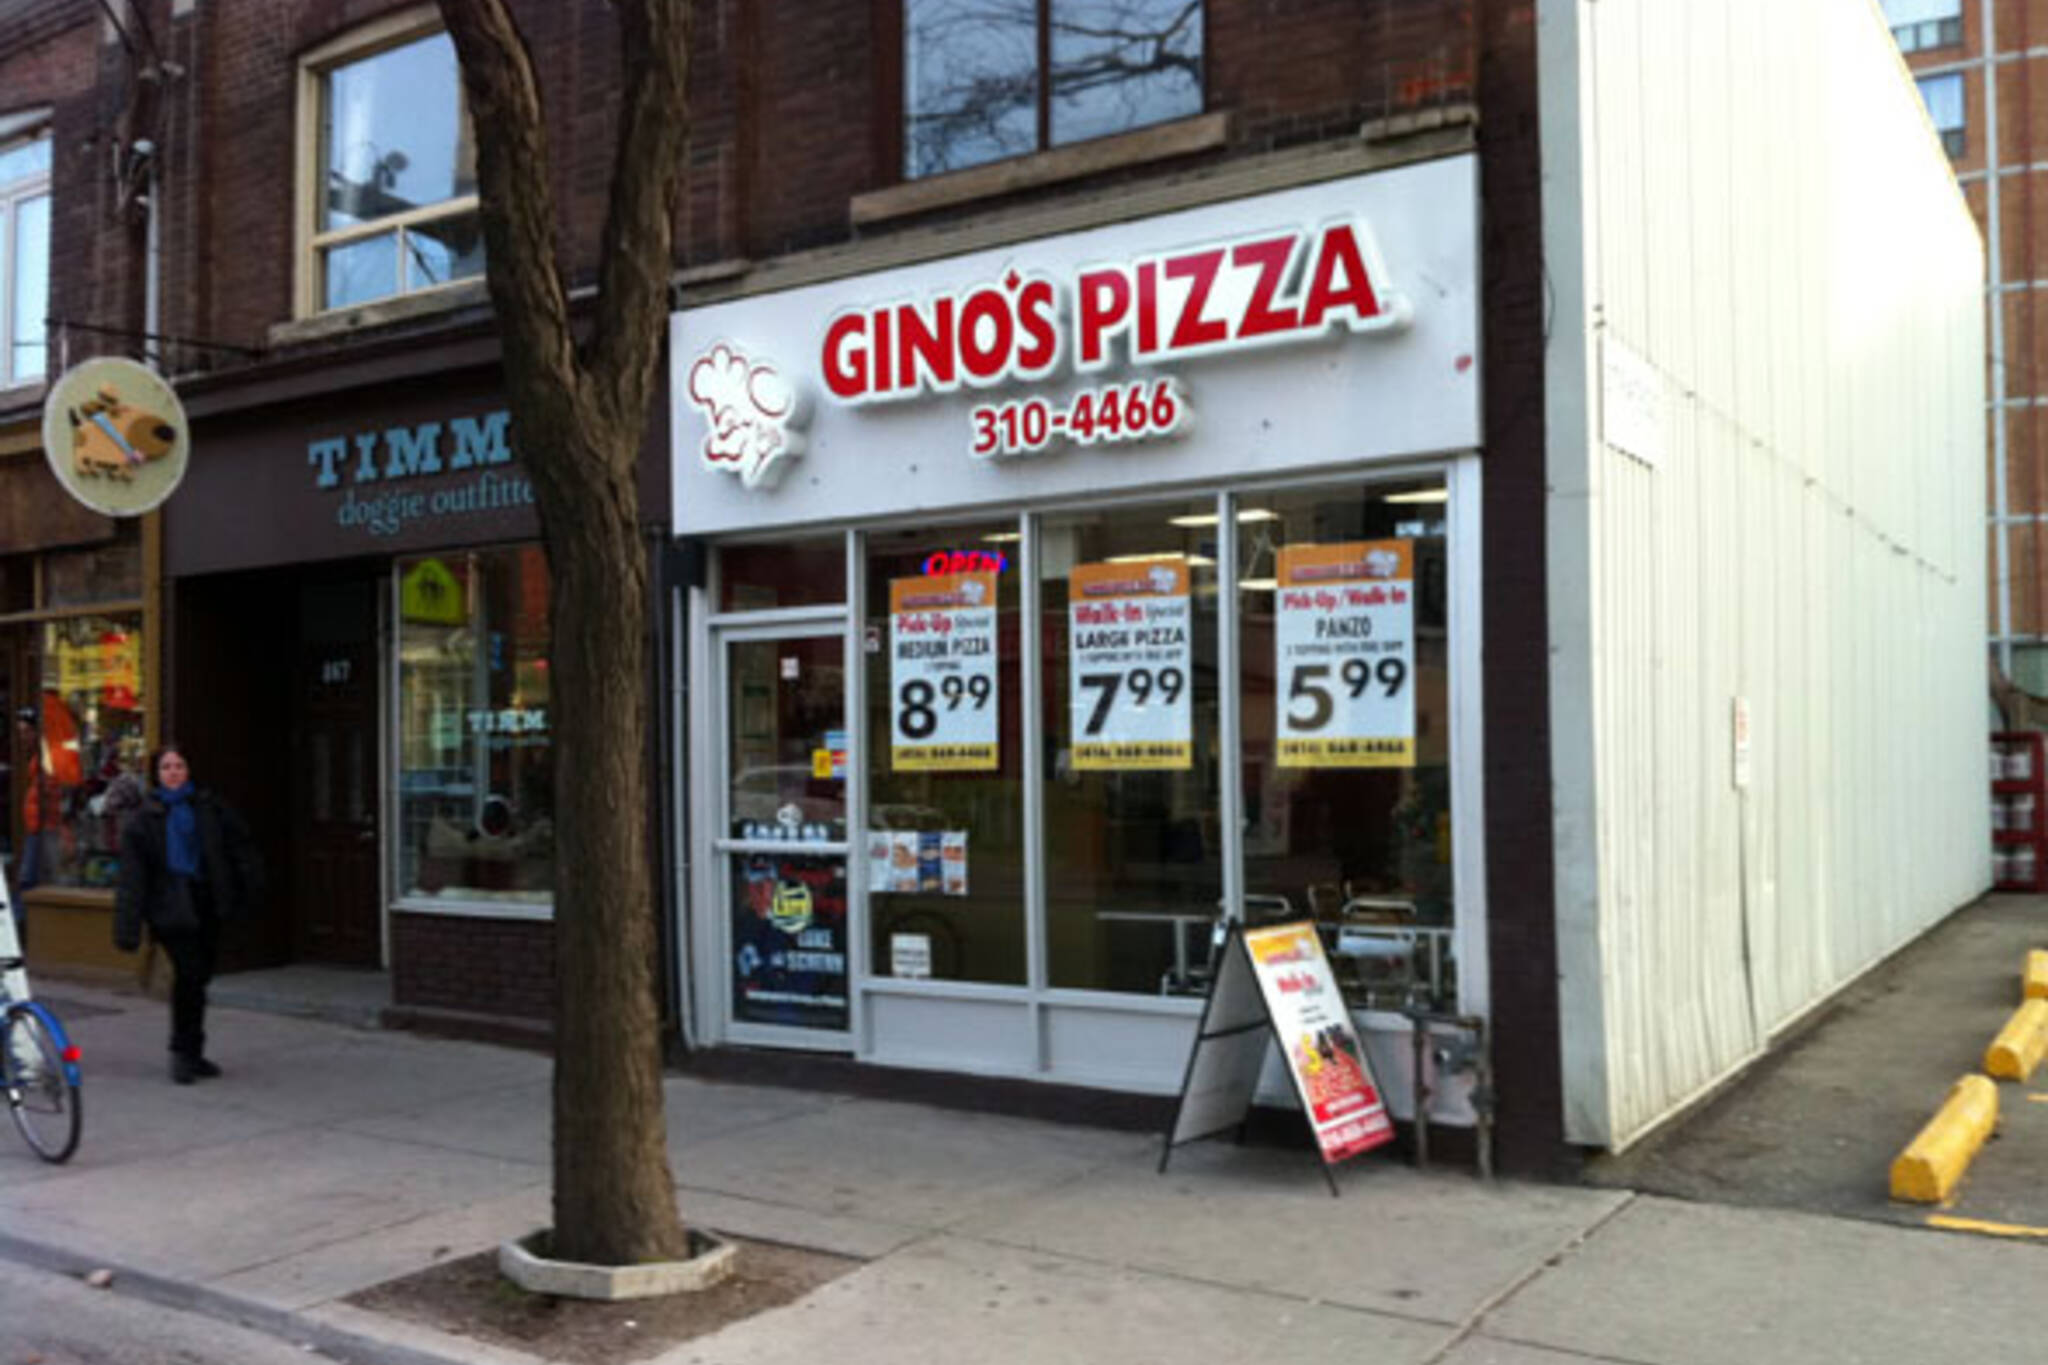 Ginos Pizza